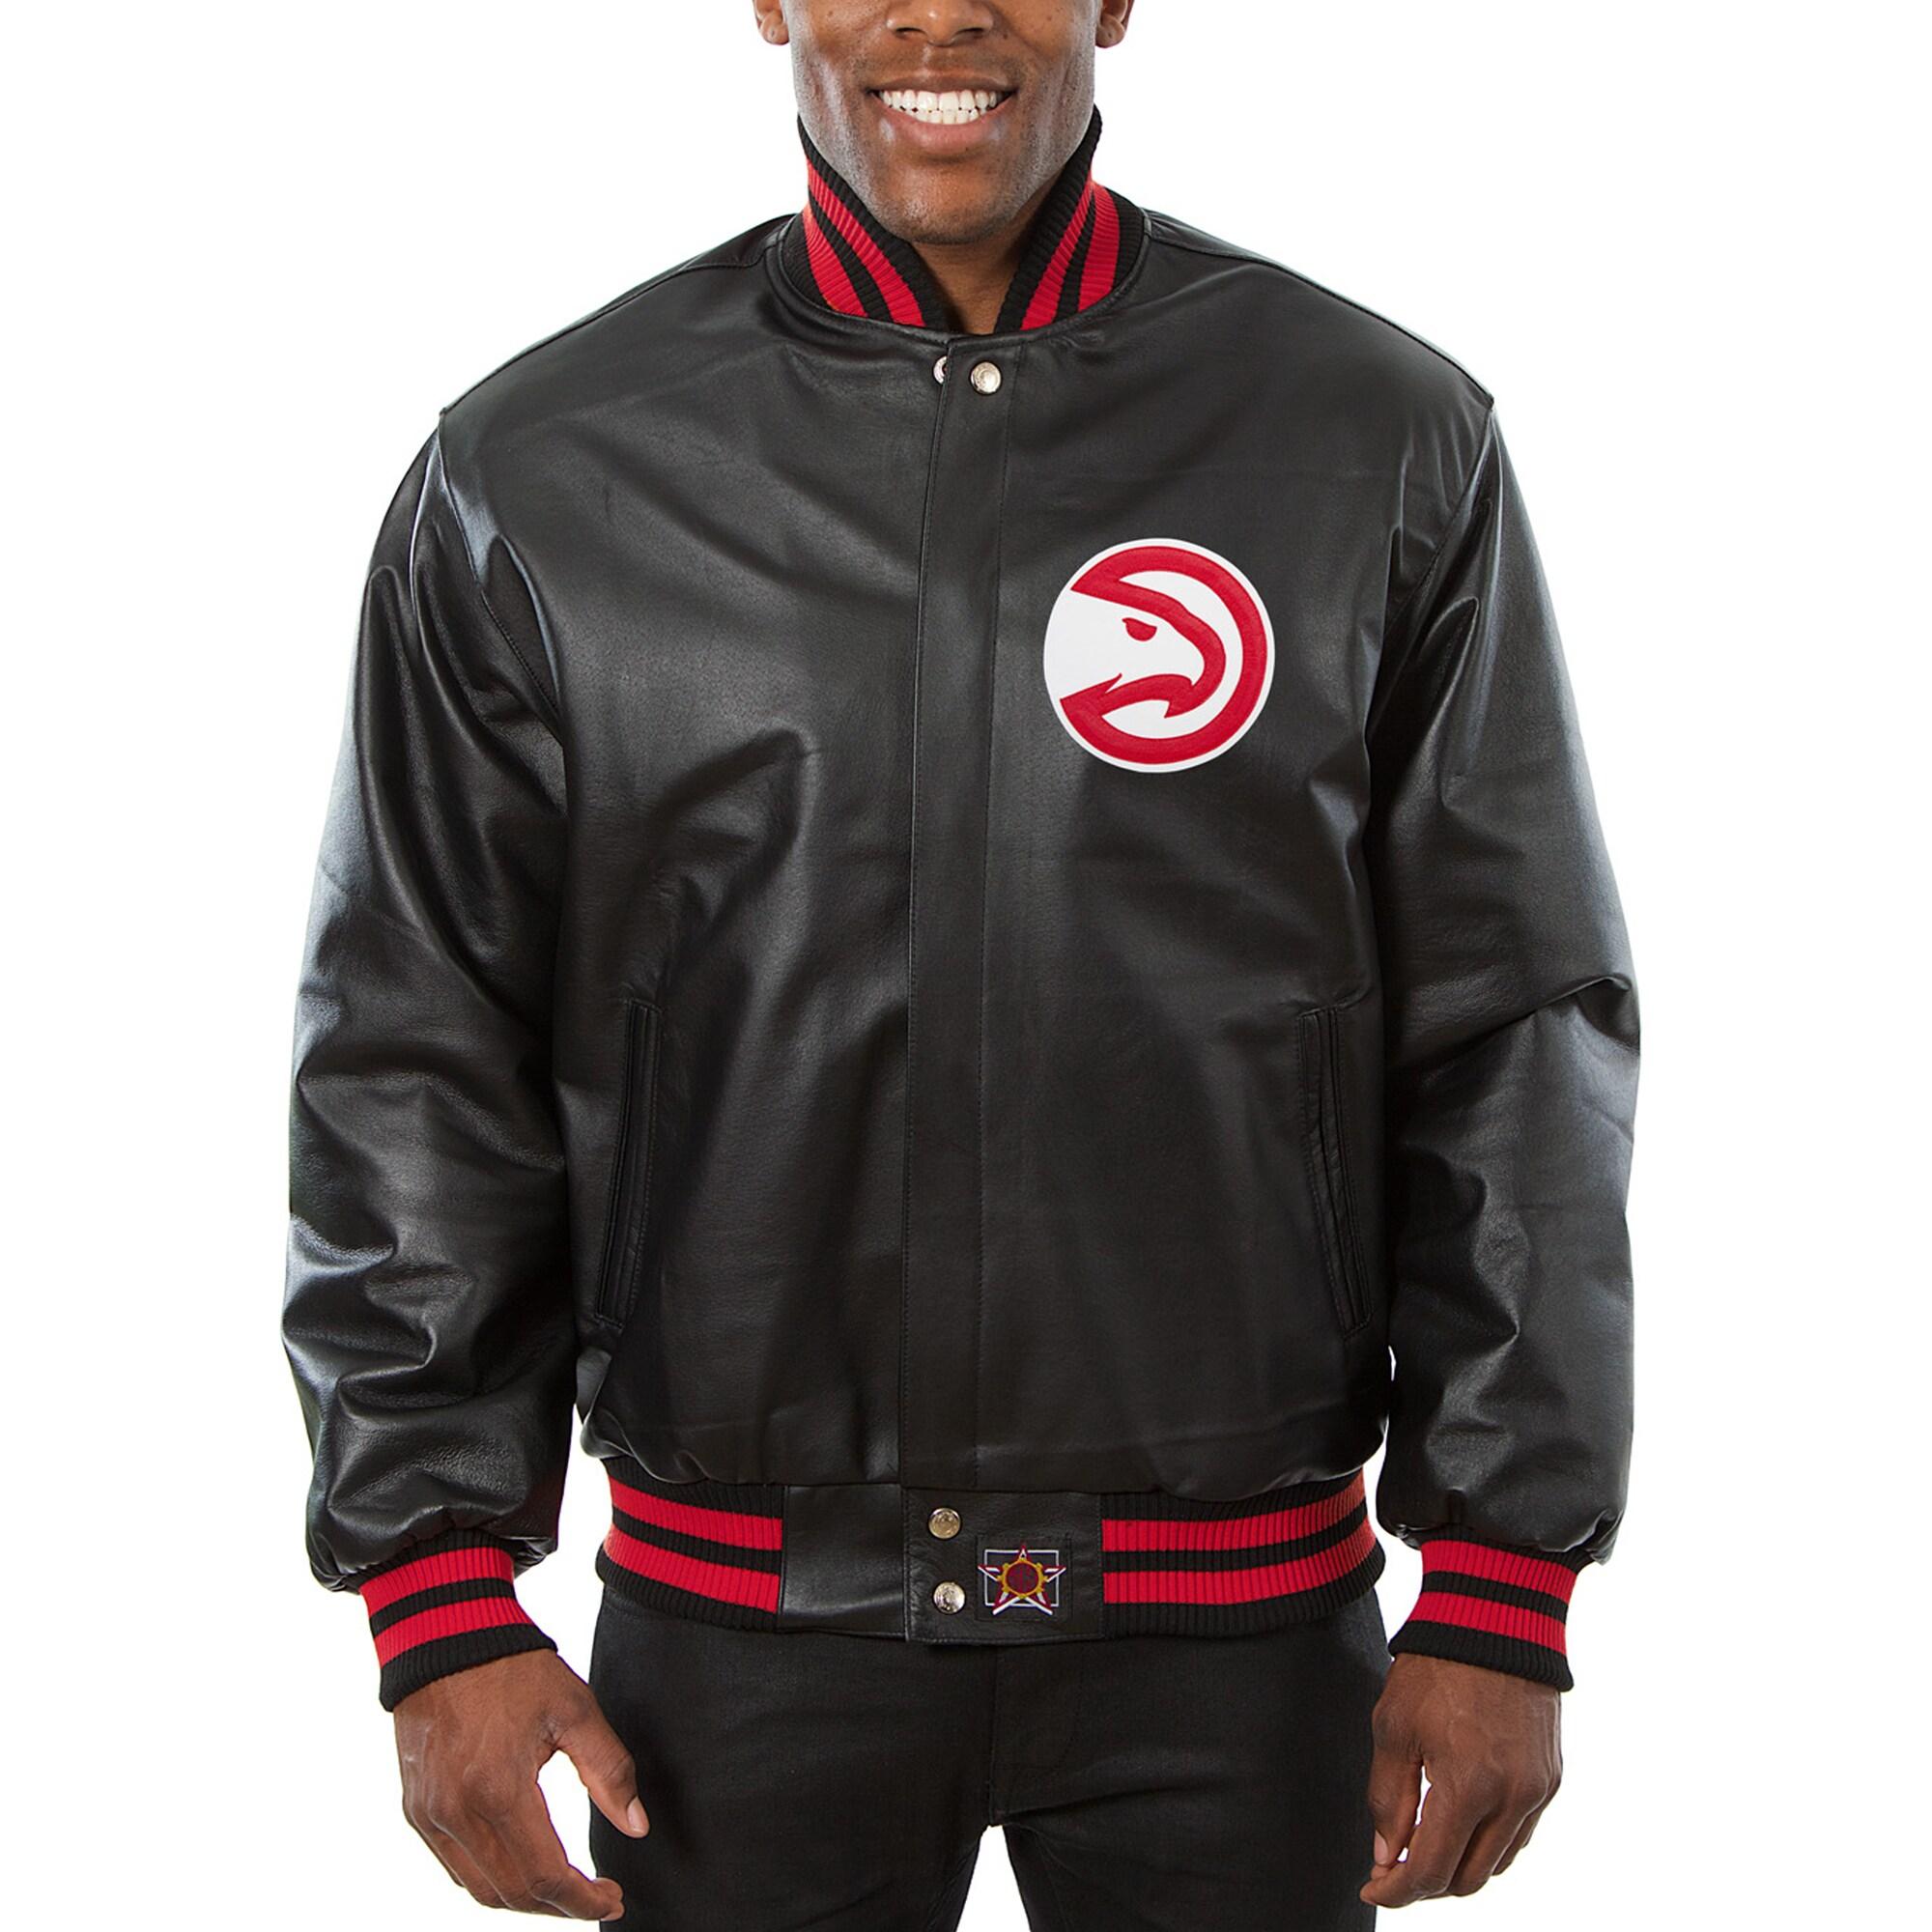 Atlanta Hawks JH Design Big & Tall All-Leather Full-Snap Jacket - Black